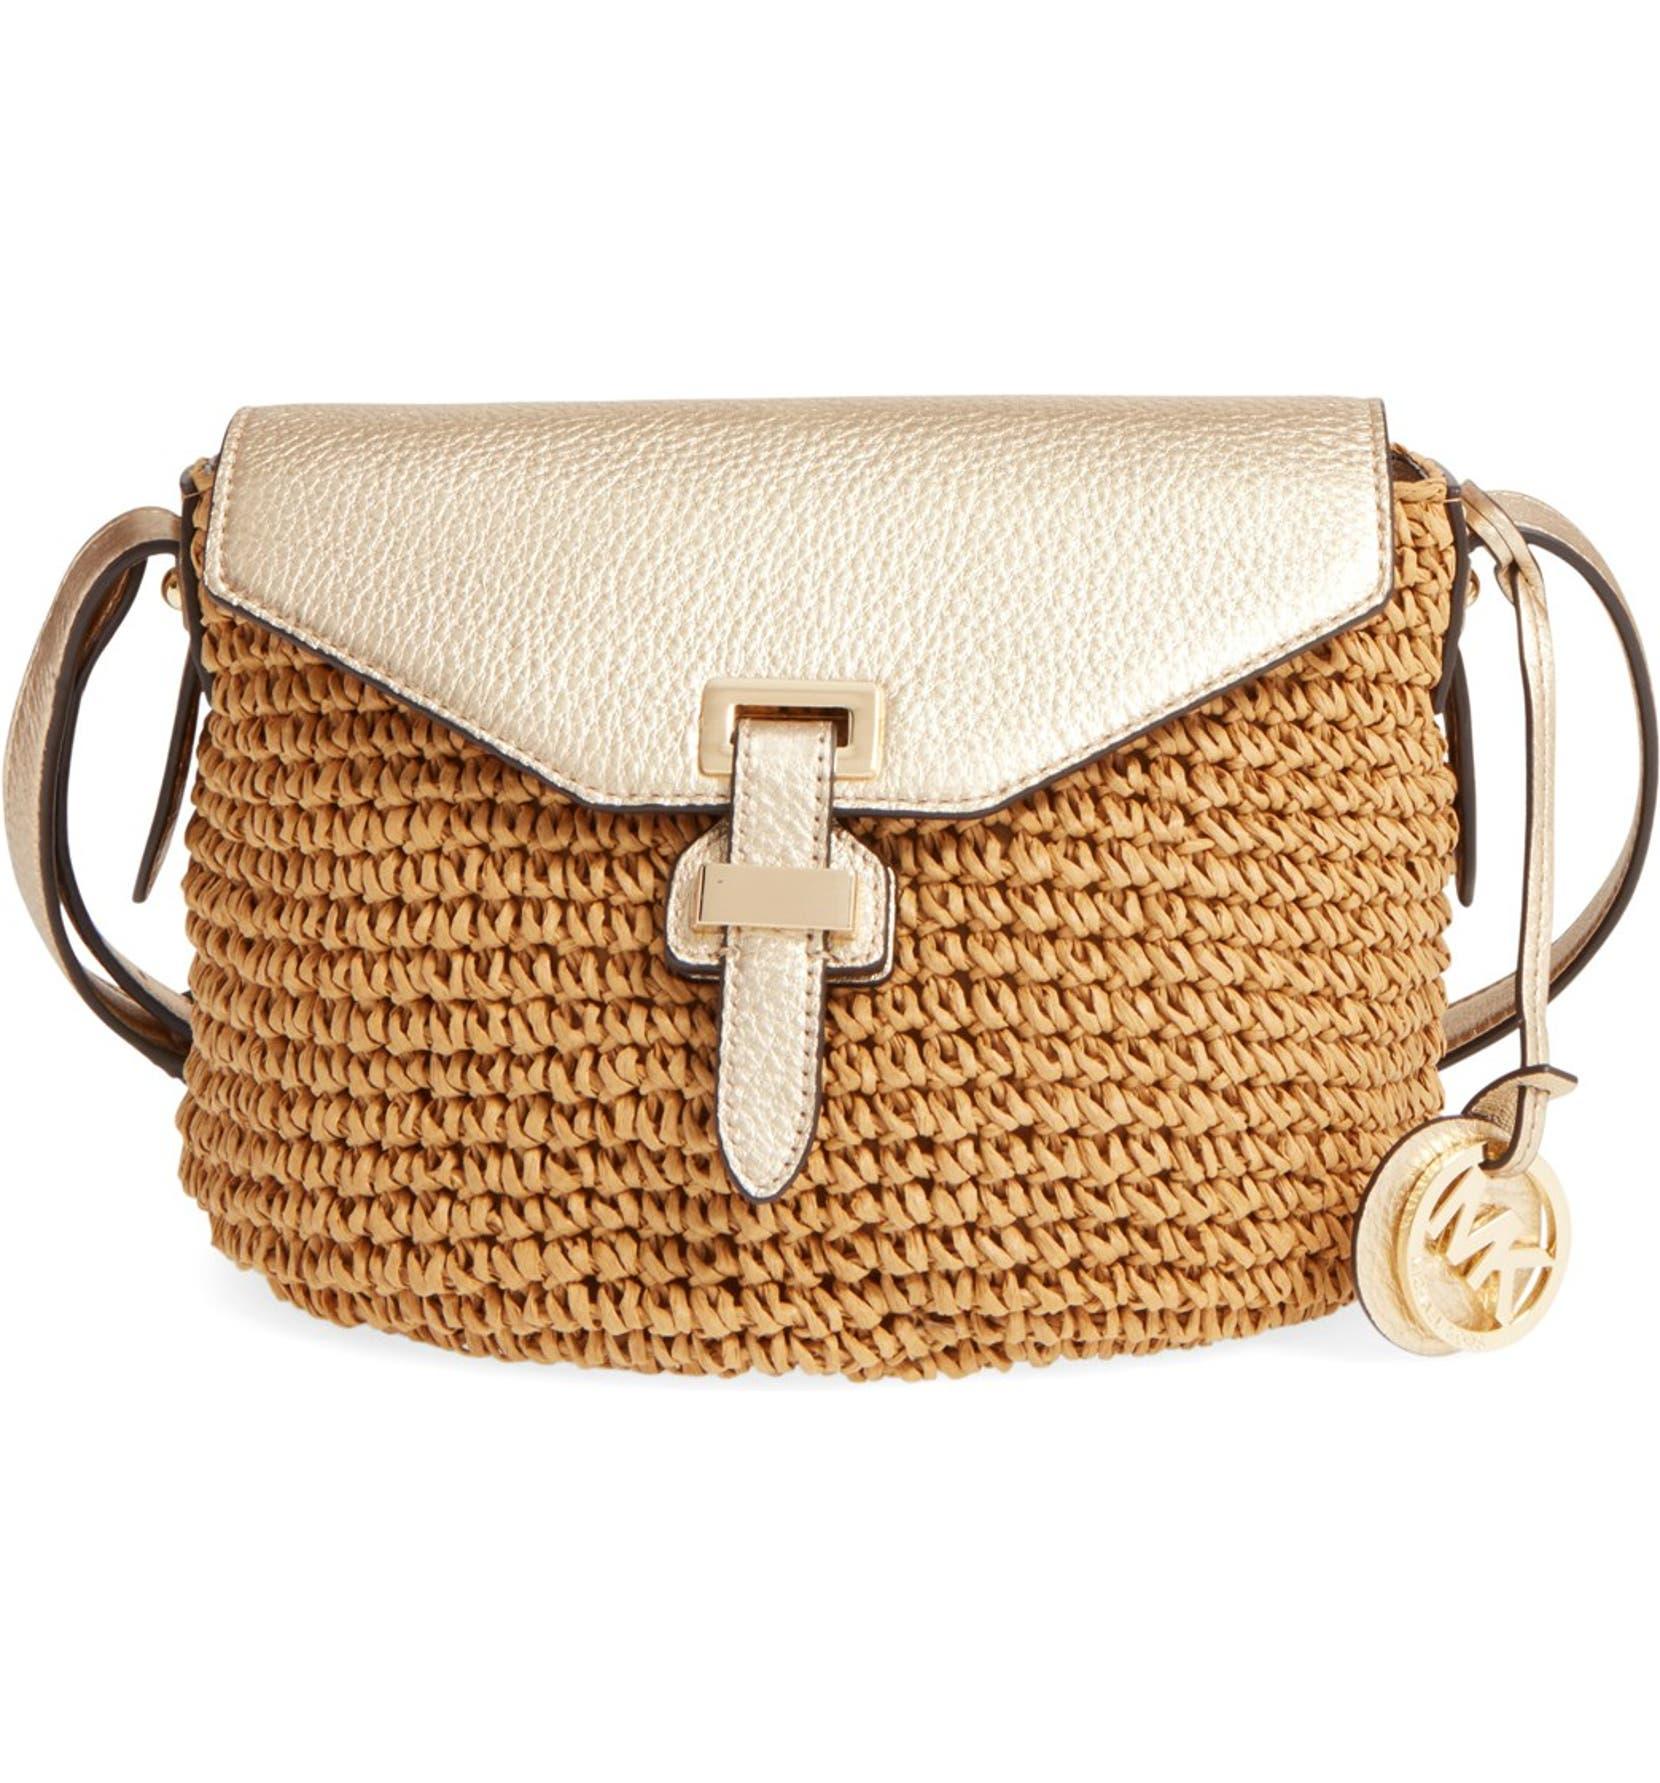 c68d2389557e MICHAEL Michael Kors 'Medium Naomi' Straw Crossbody Bag | Nordstrom